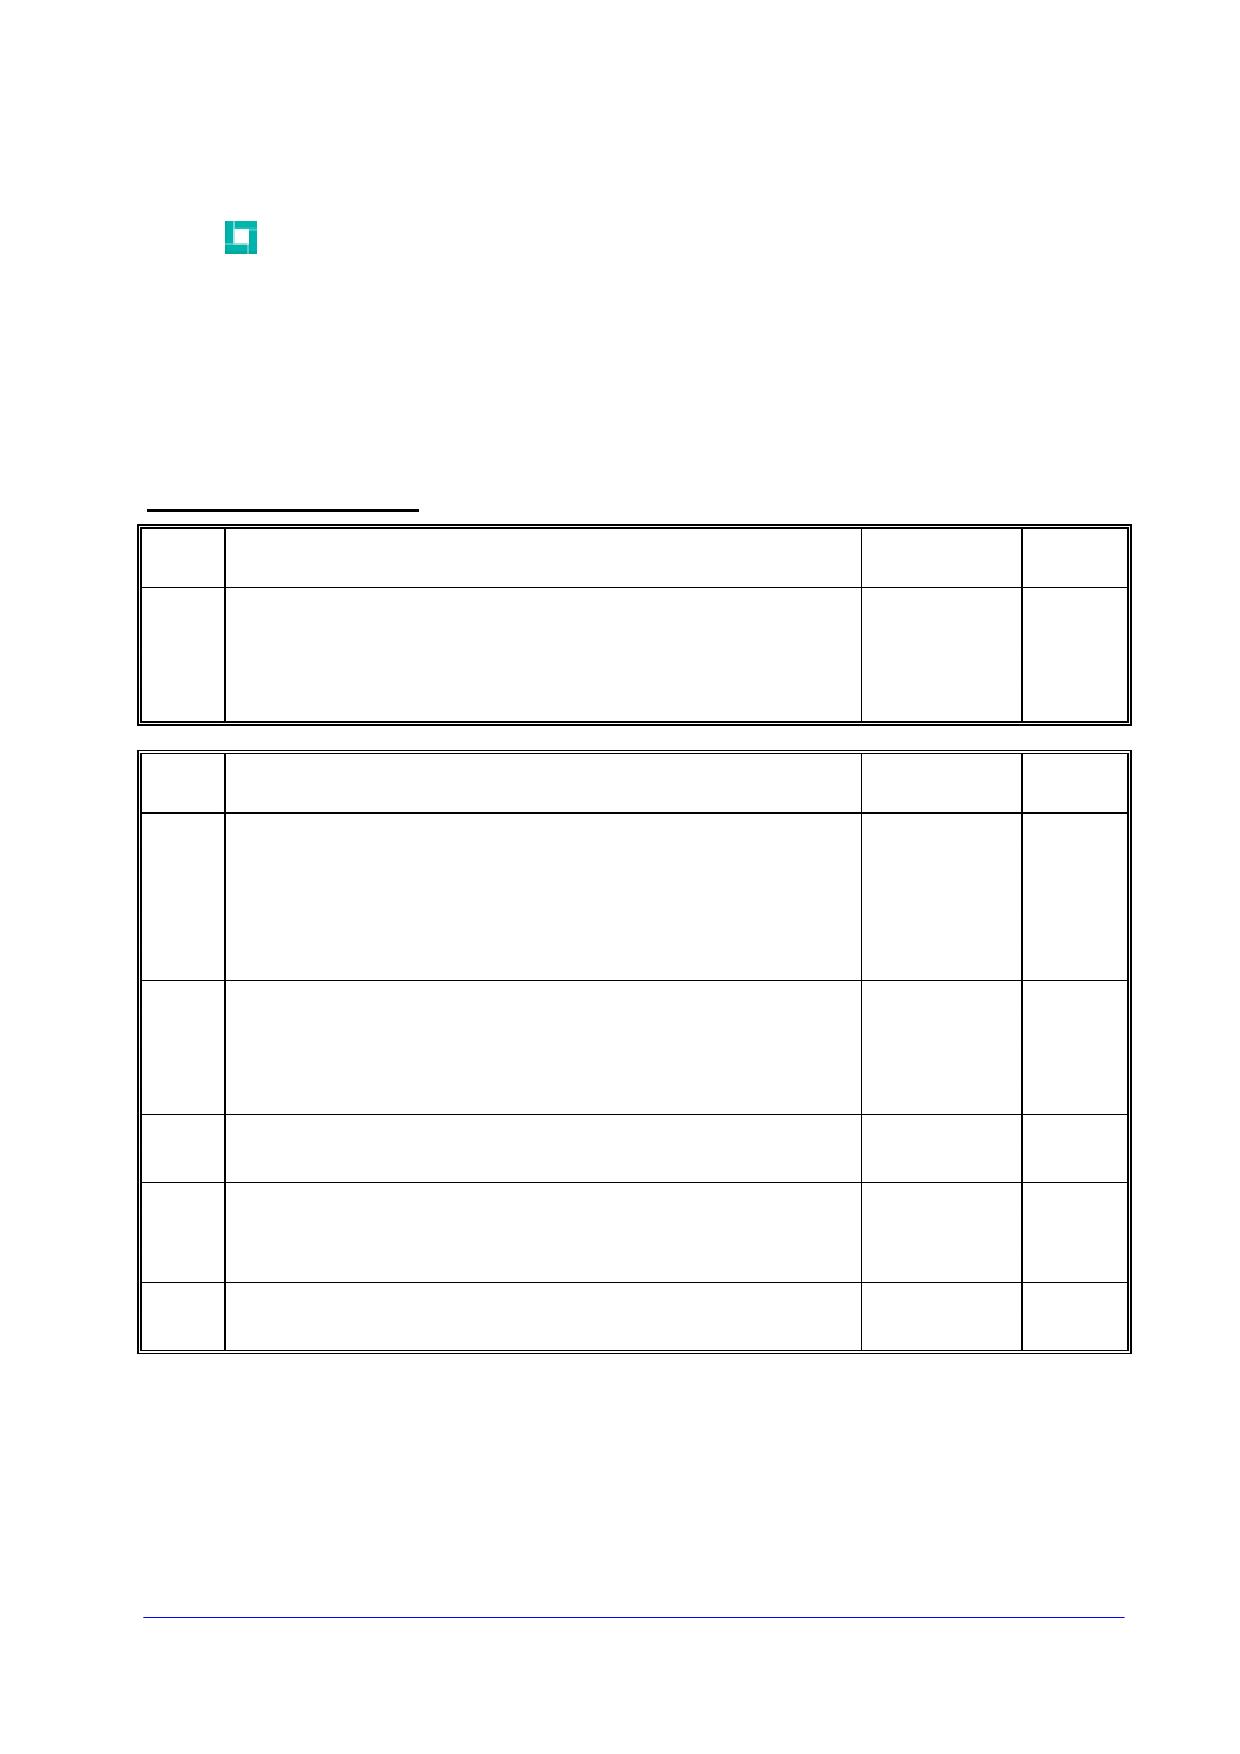 K0890NC380 datasheet